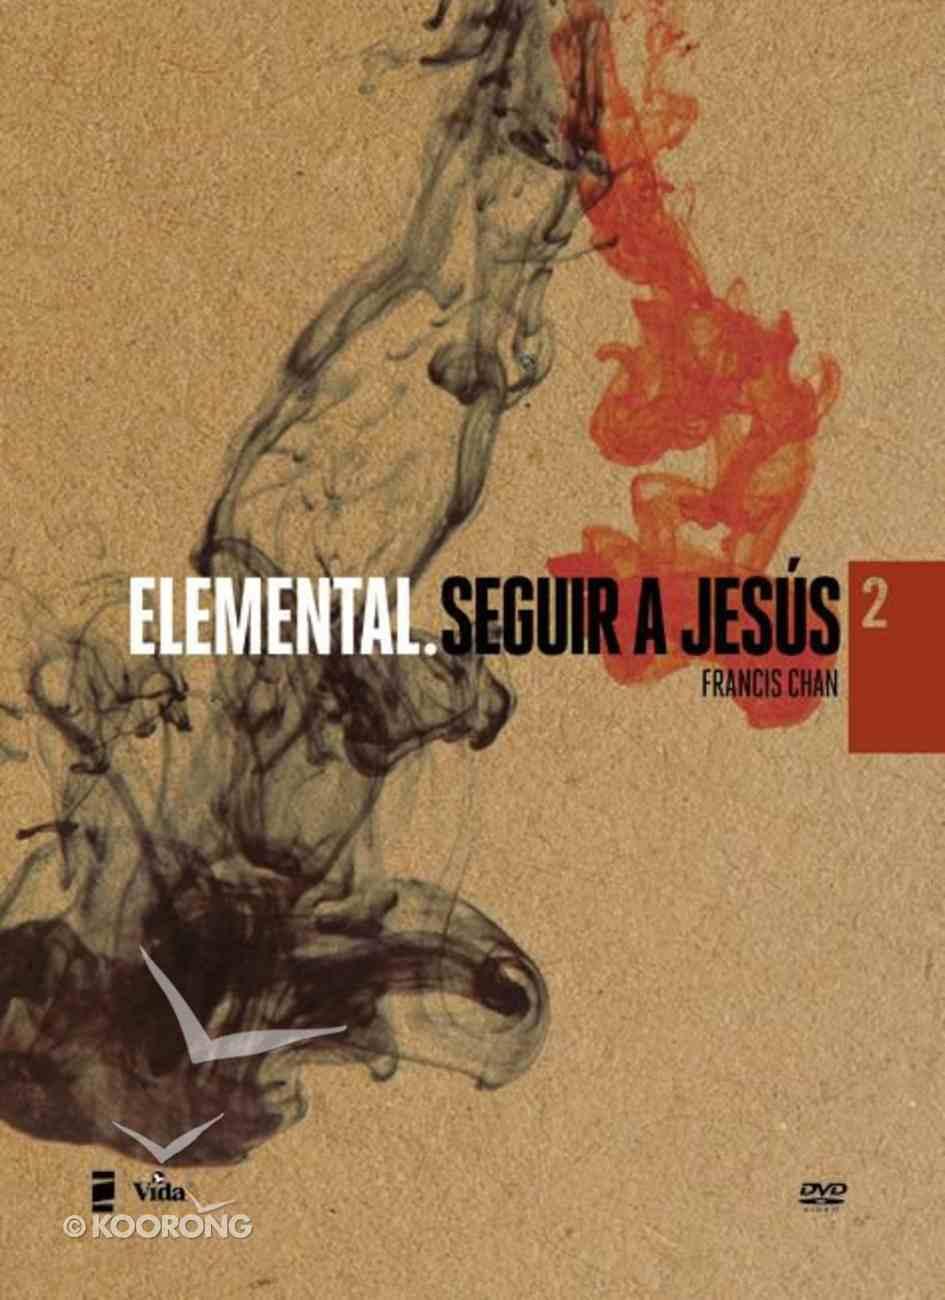 Elemental Seguir a Jesus (Basic: Who is God?) (Volume 2) (#02 in Basic. Dvd Series) DVD